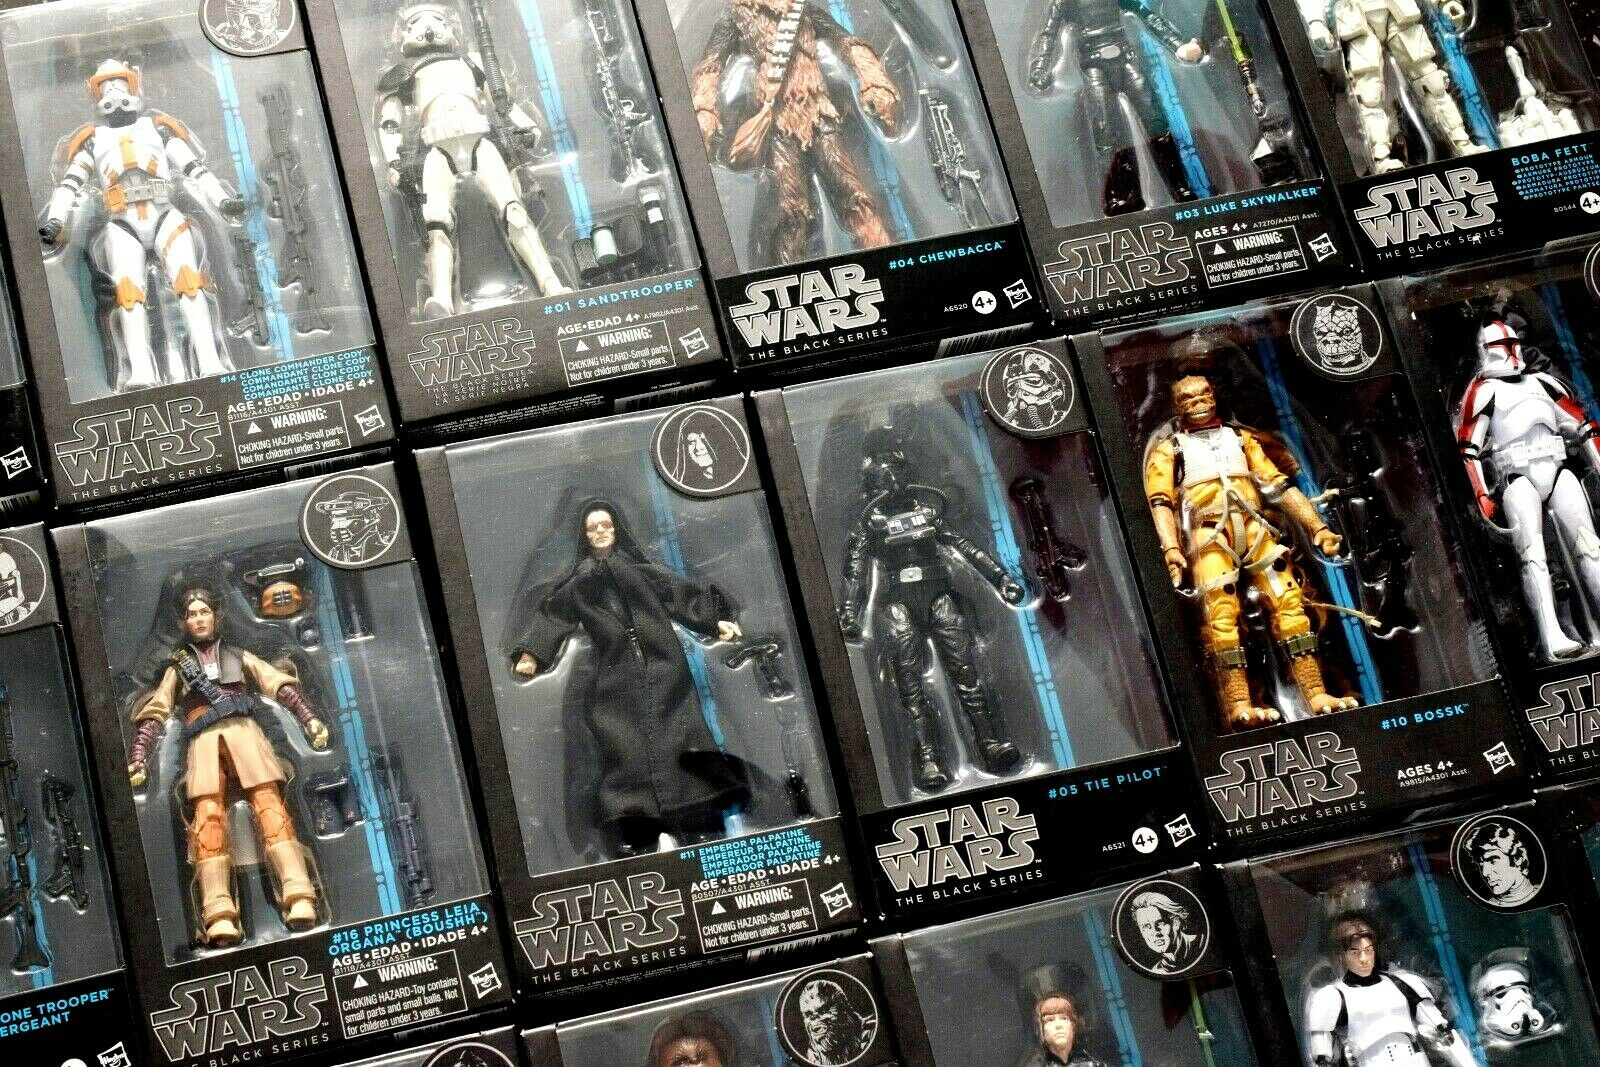 Star Wars B bluee Streifen 15.2cm blacke Serie Figuren - Alle Misb